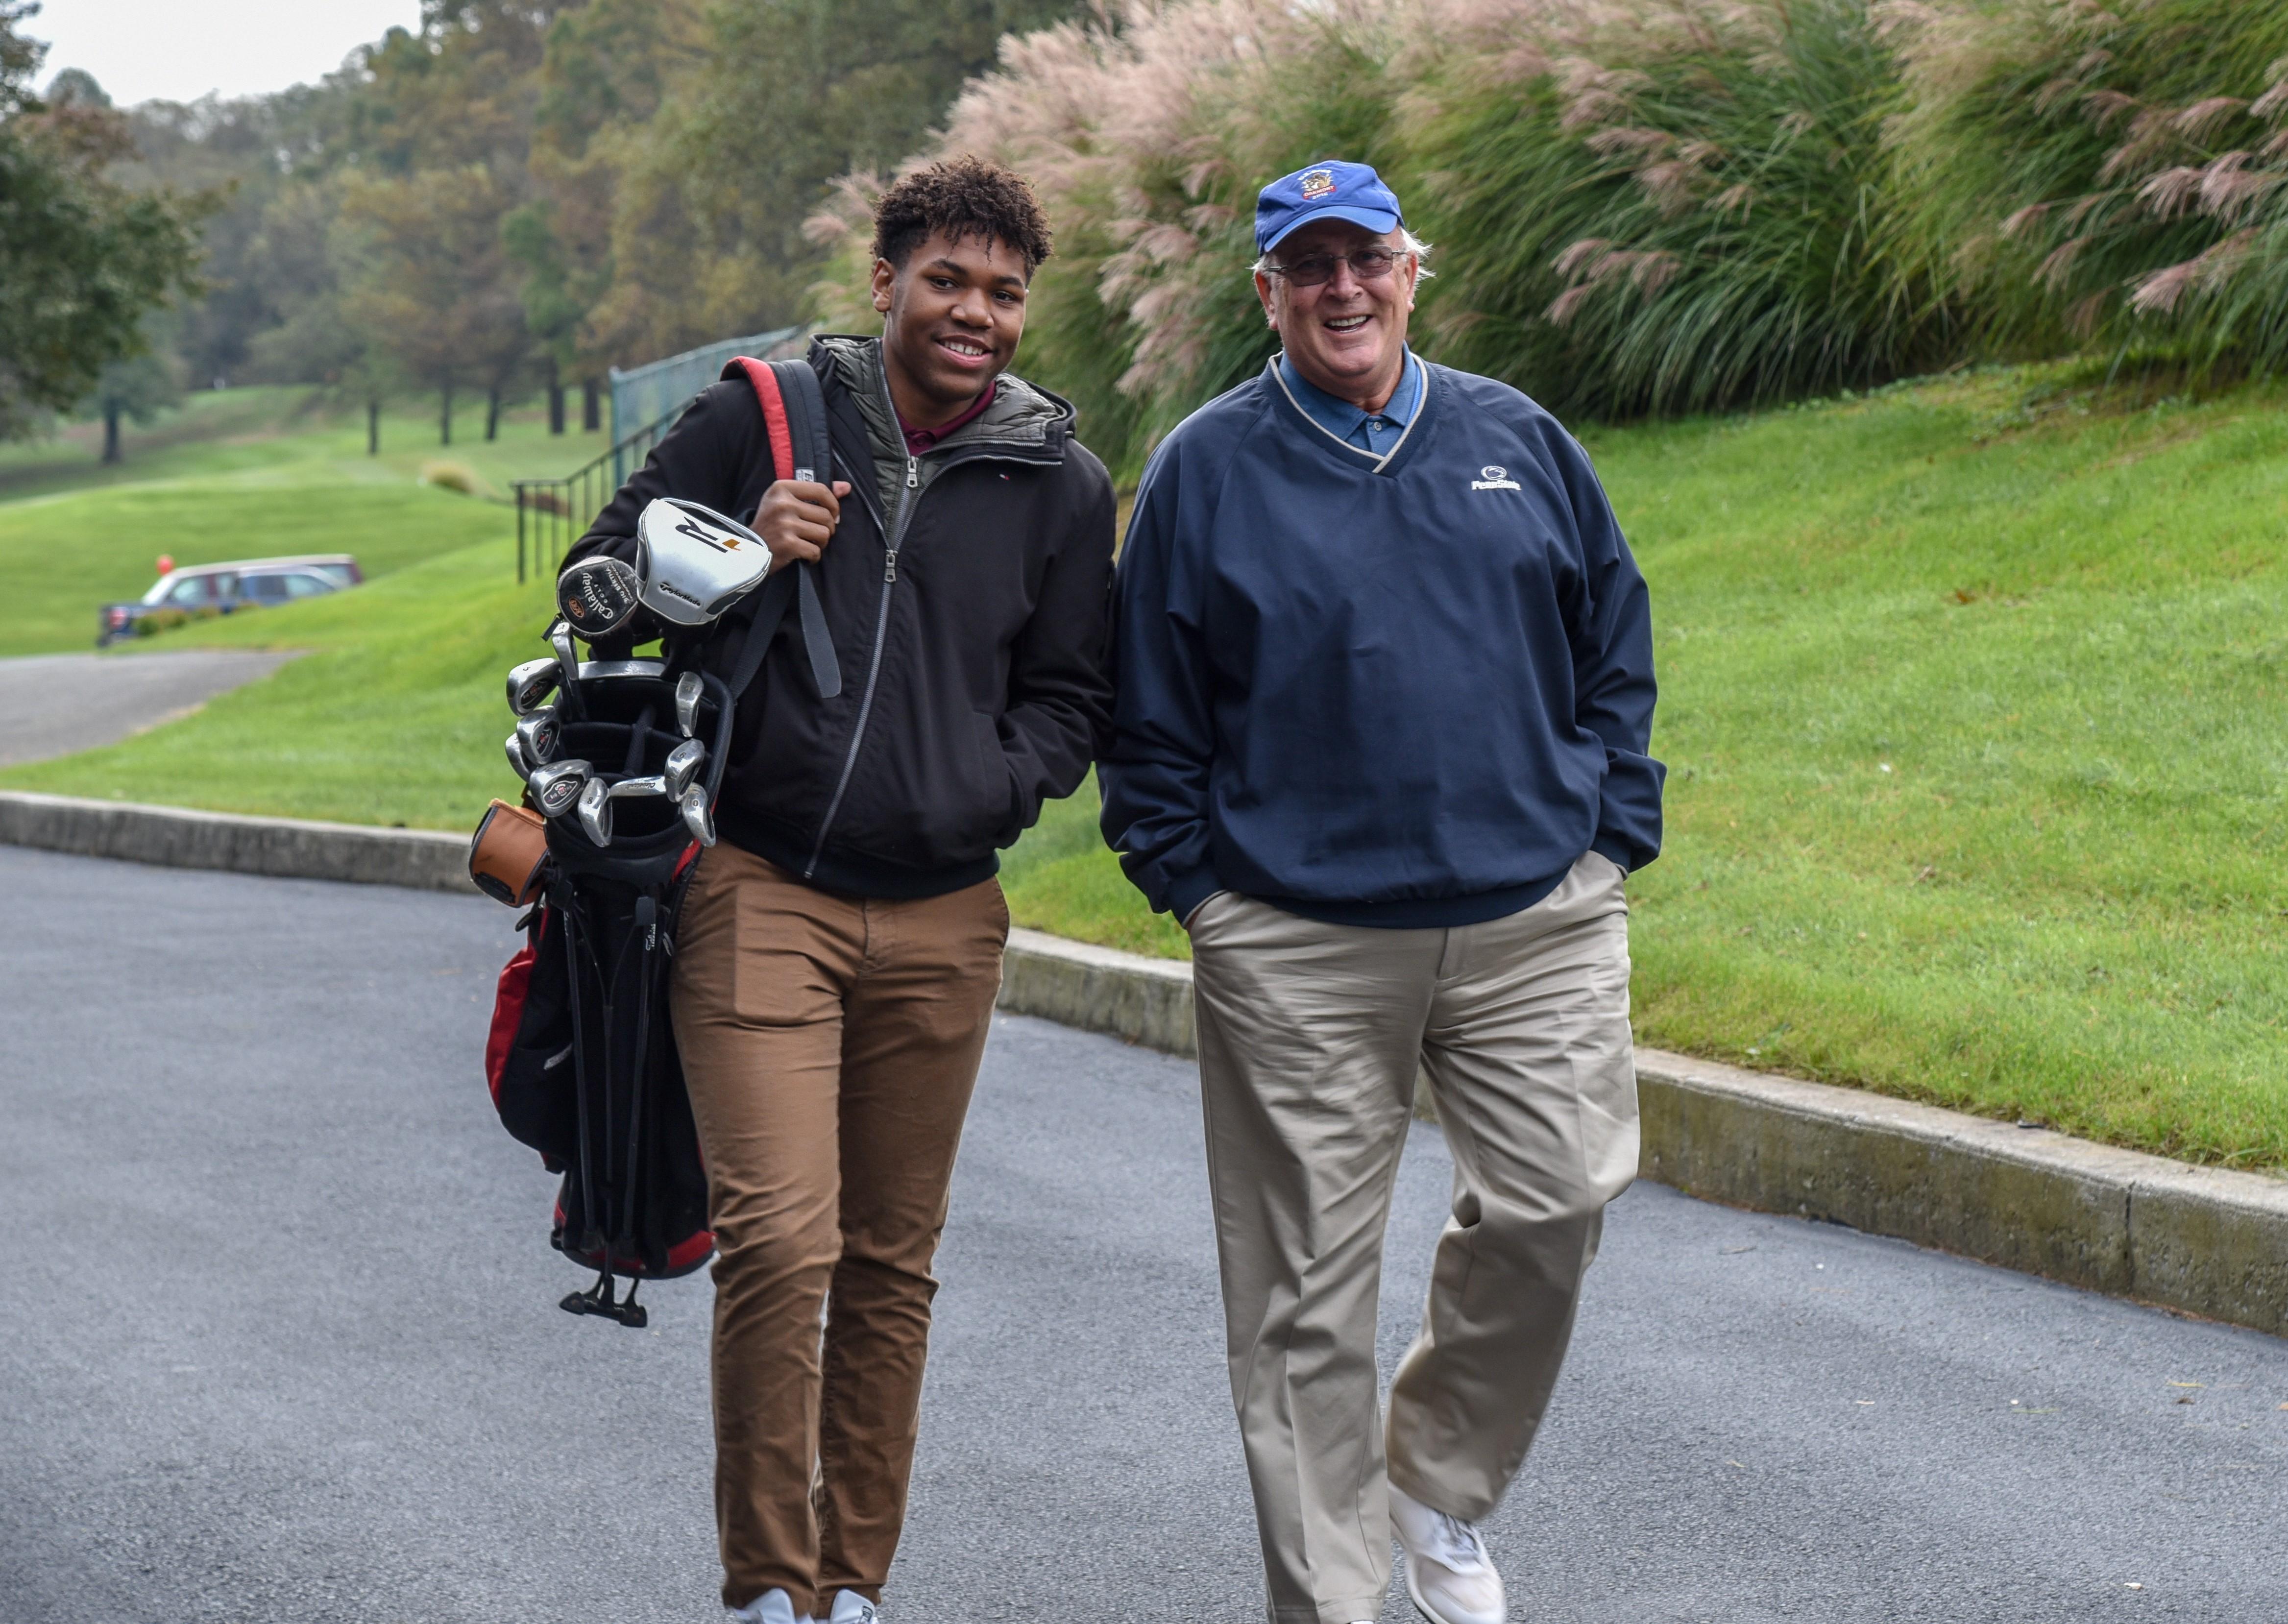 Church Farm School Golf Classic Presented by DNB First Set for Sept. 19 at French Creek Golf Club